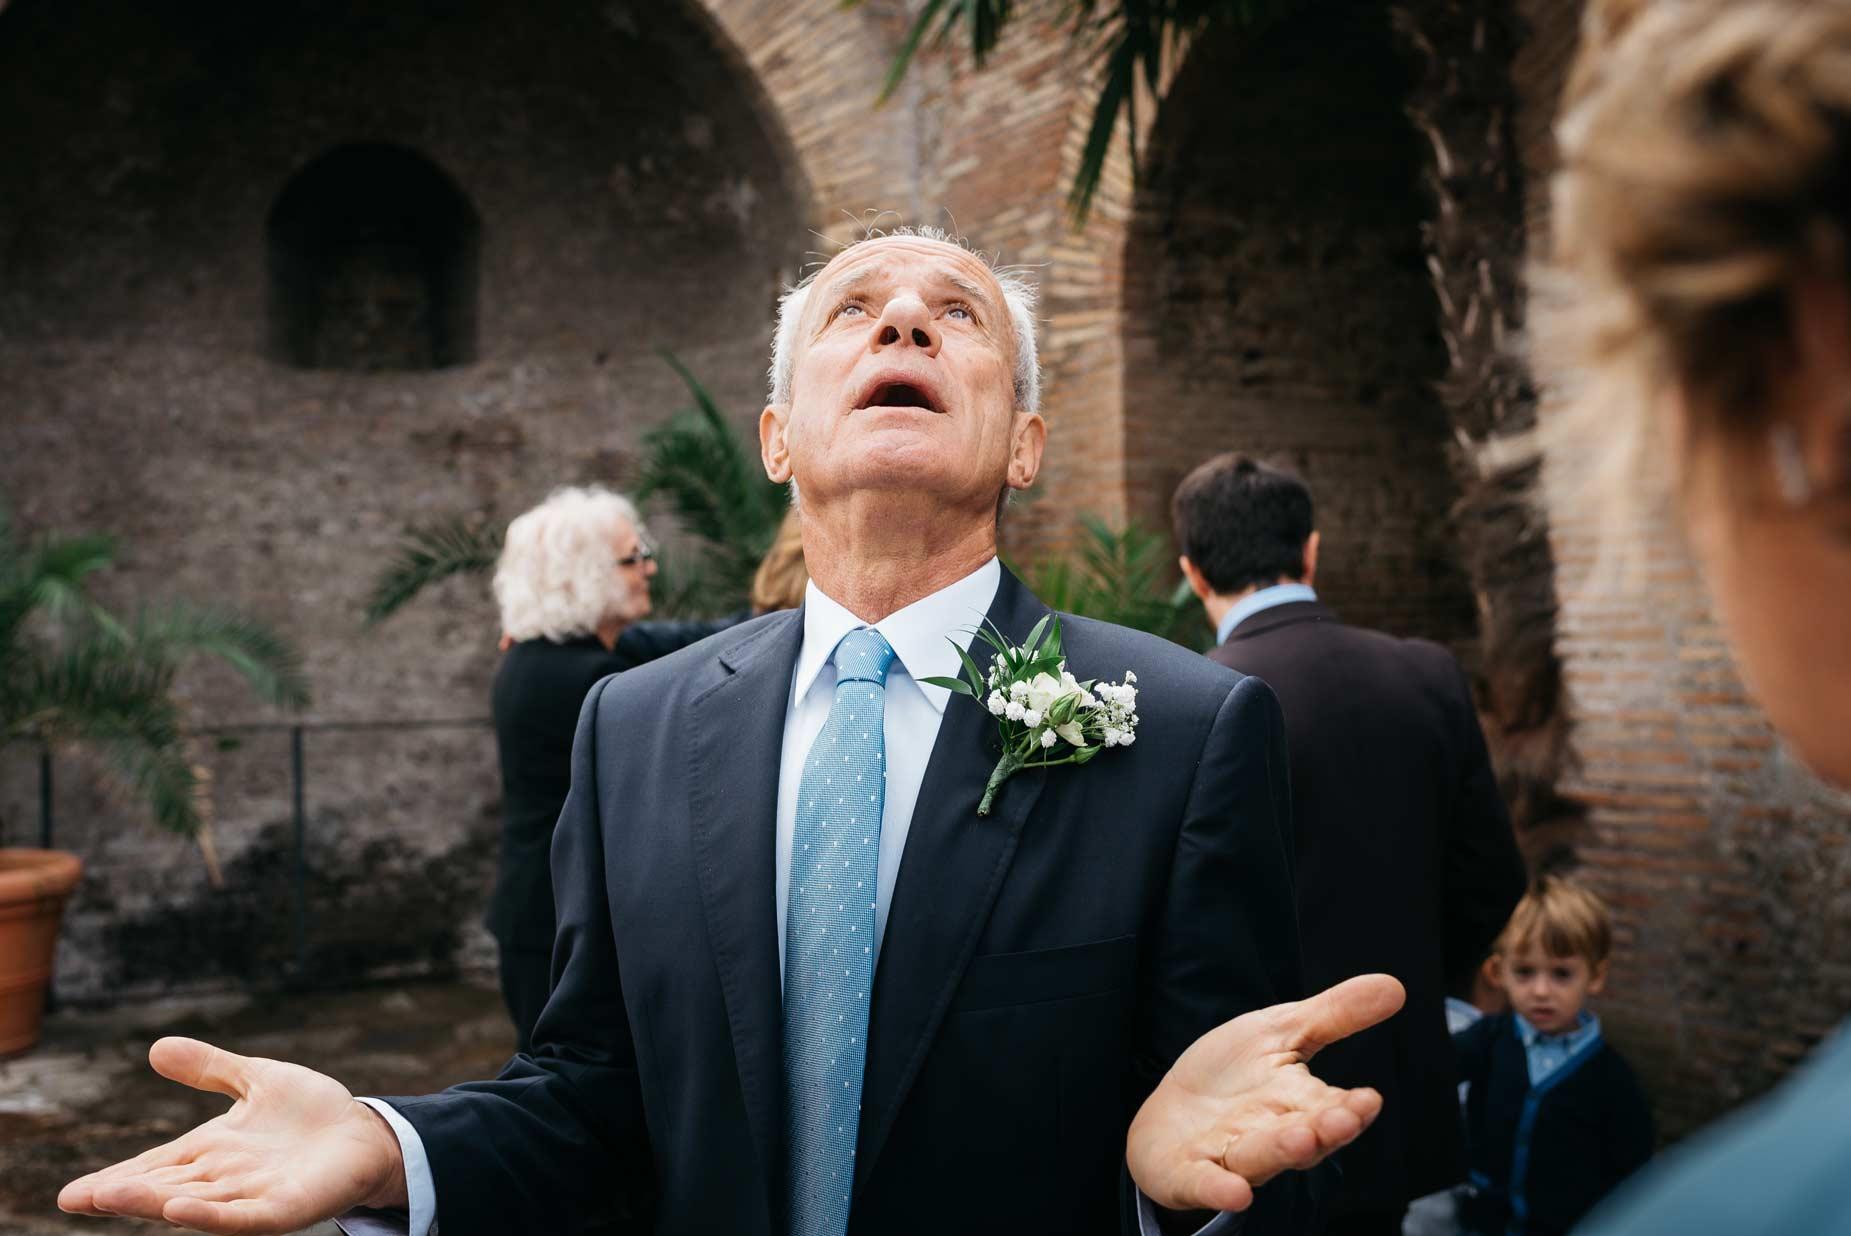 Destination-Wedding-Italy-Ceremony